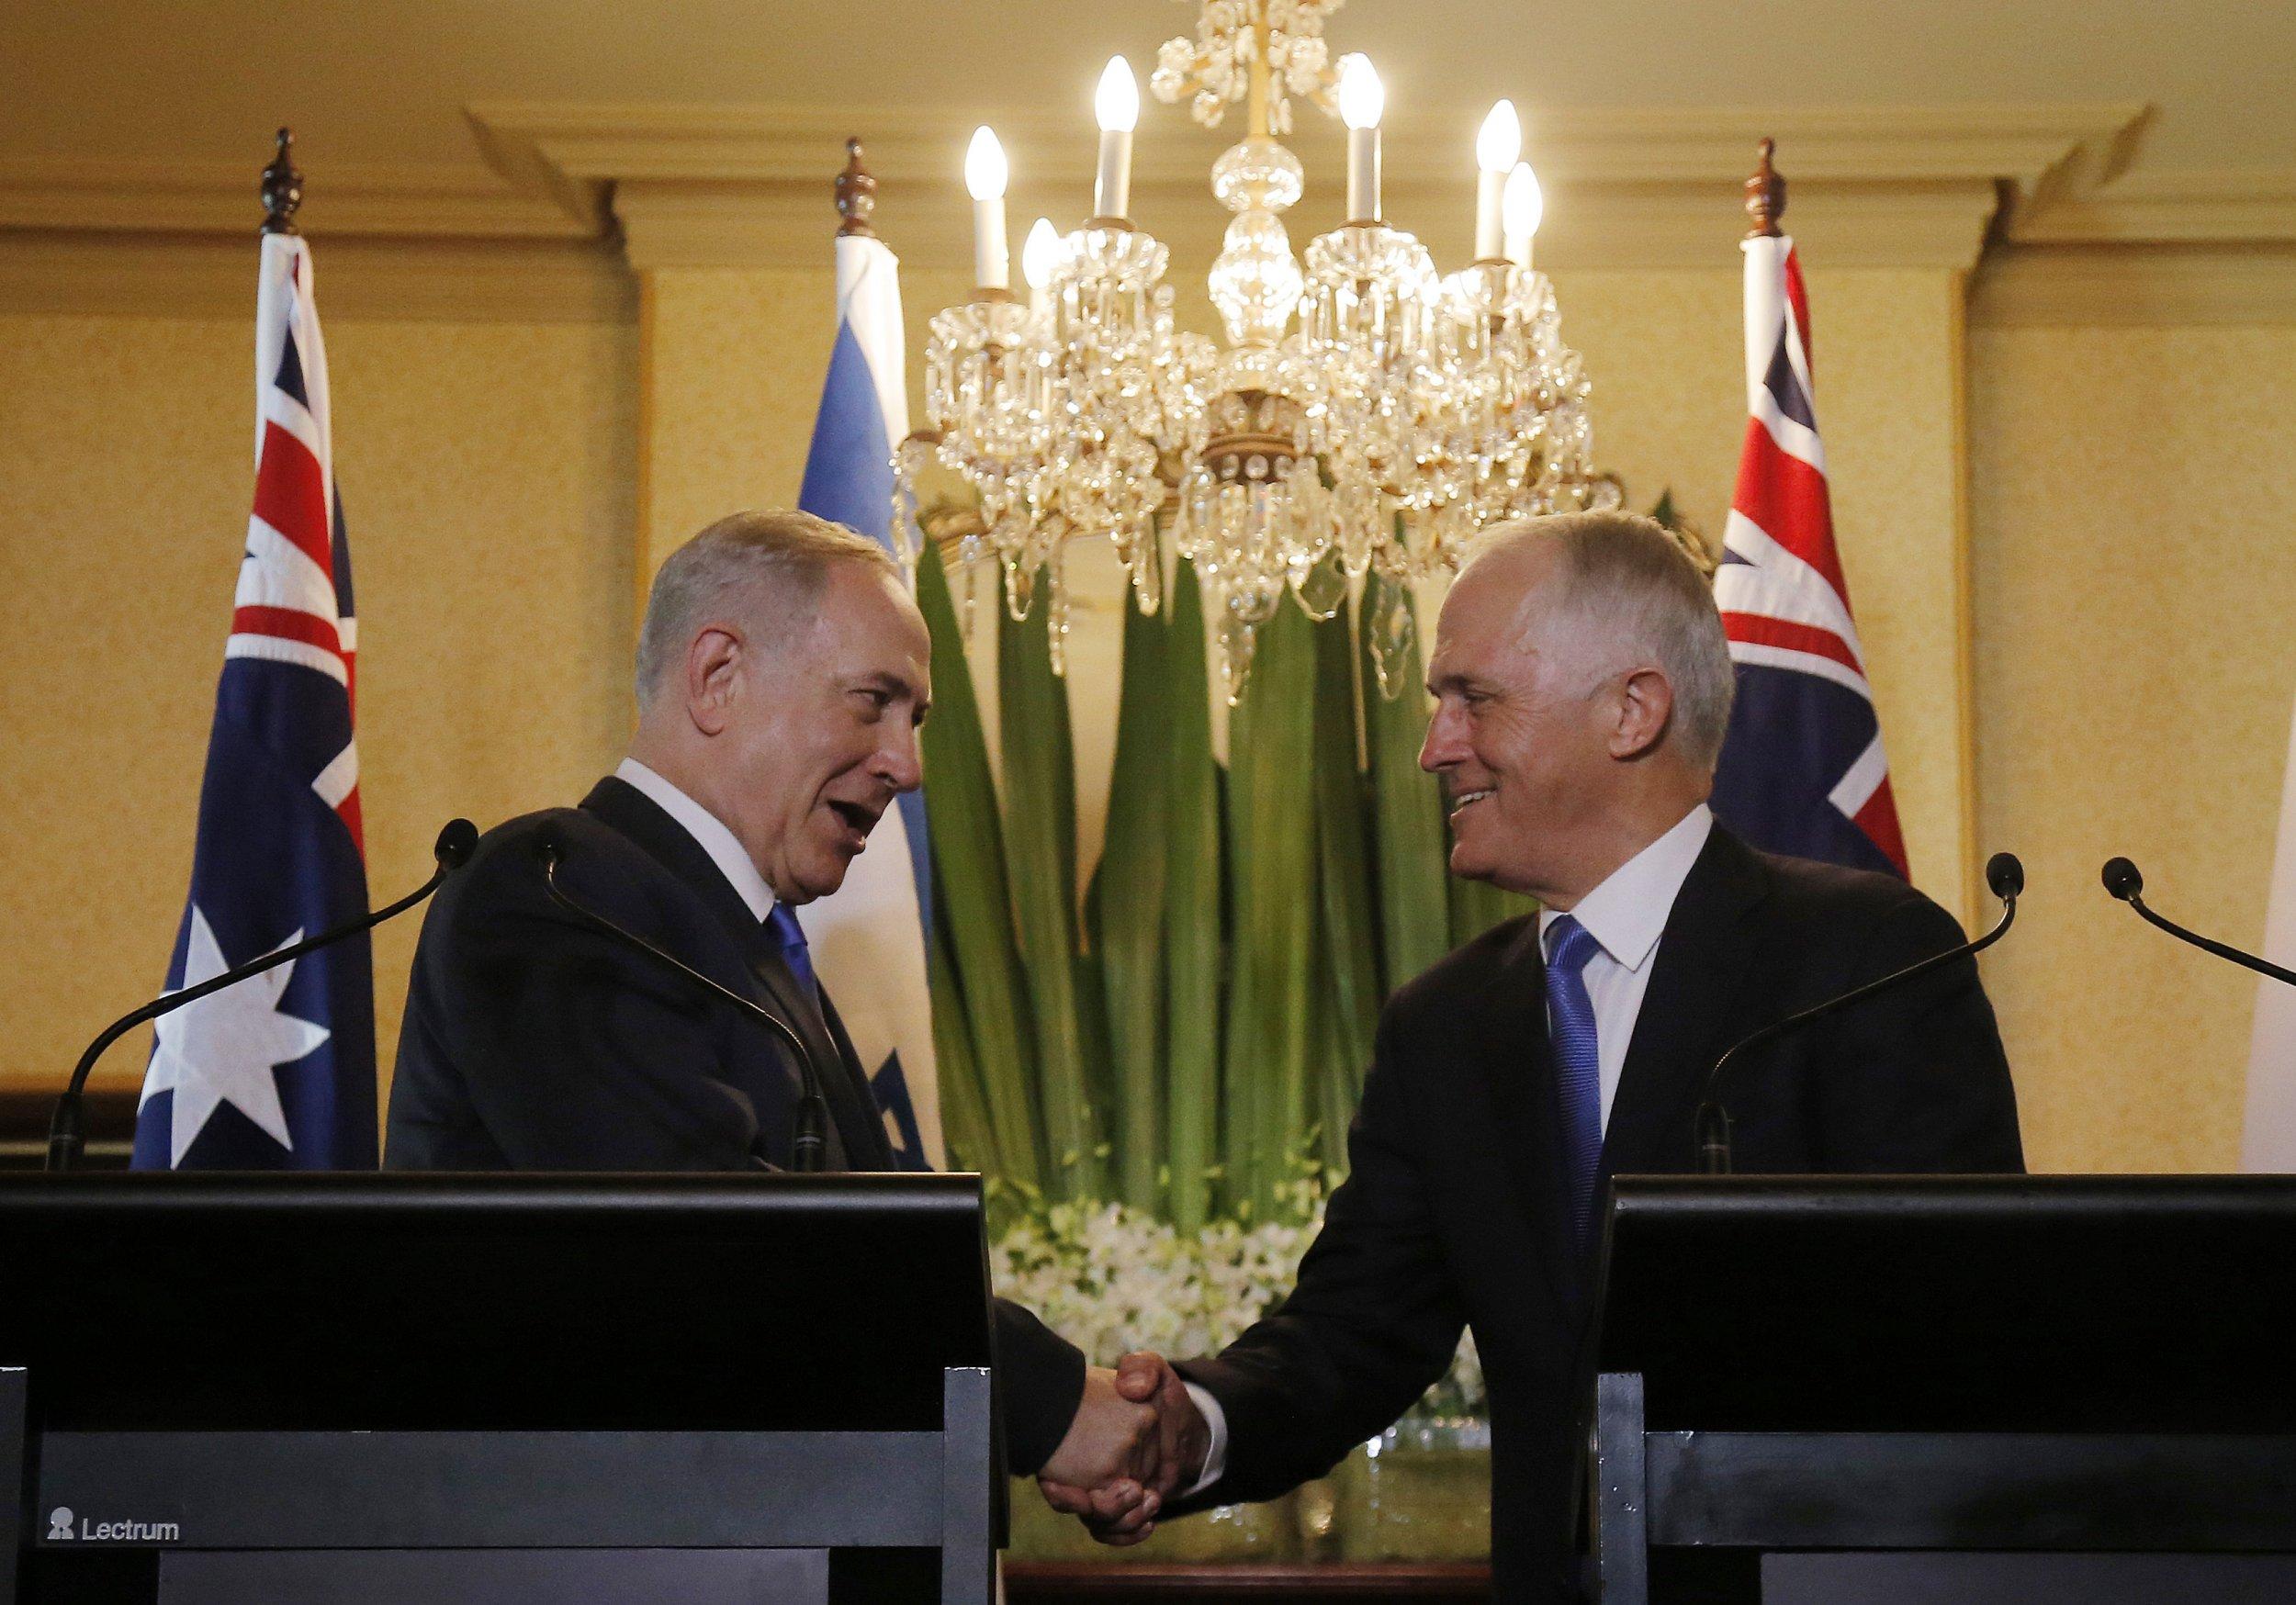 Netanyahu and Turnbull